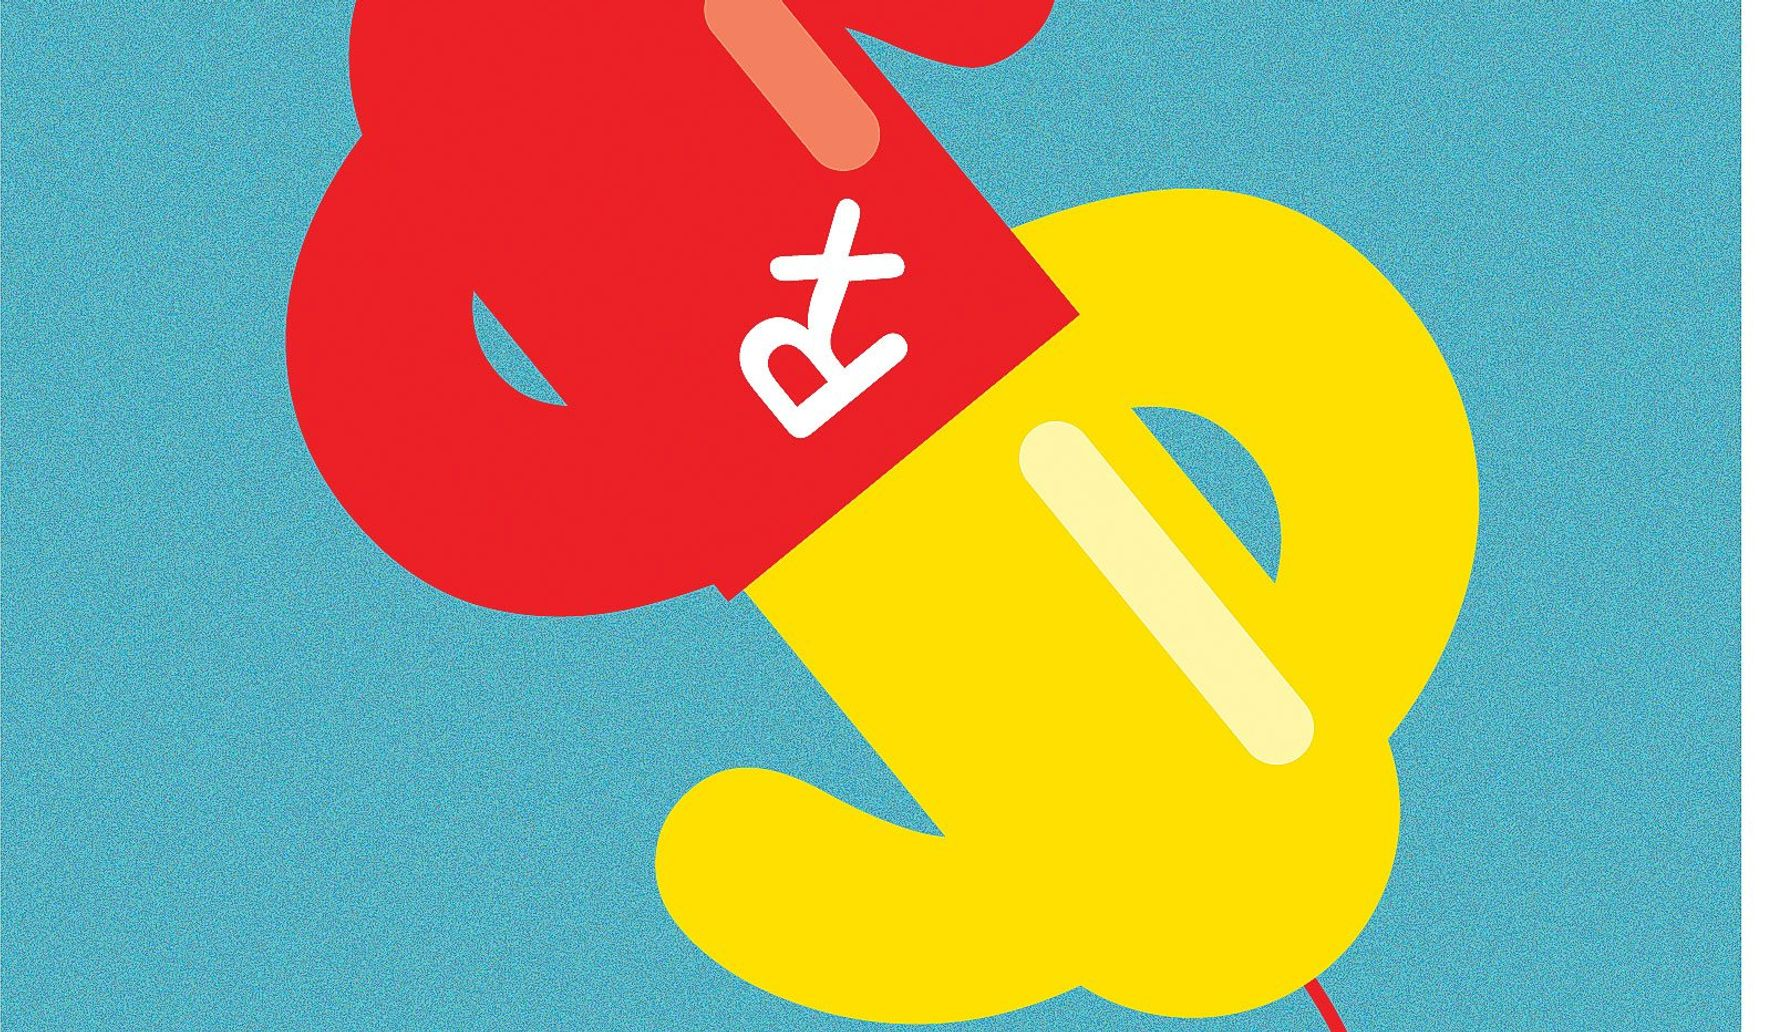 Prescription-drug price gouging must stop